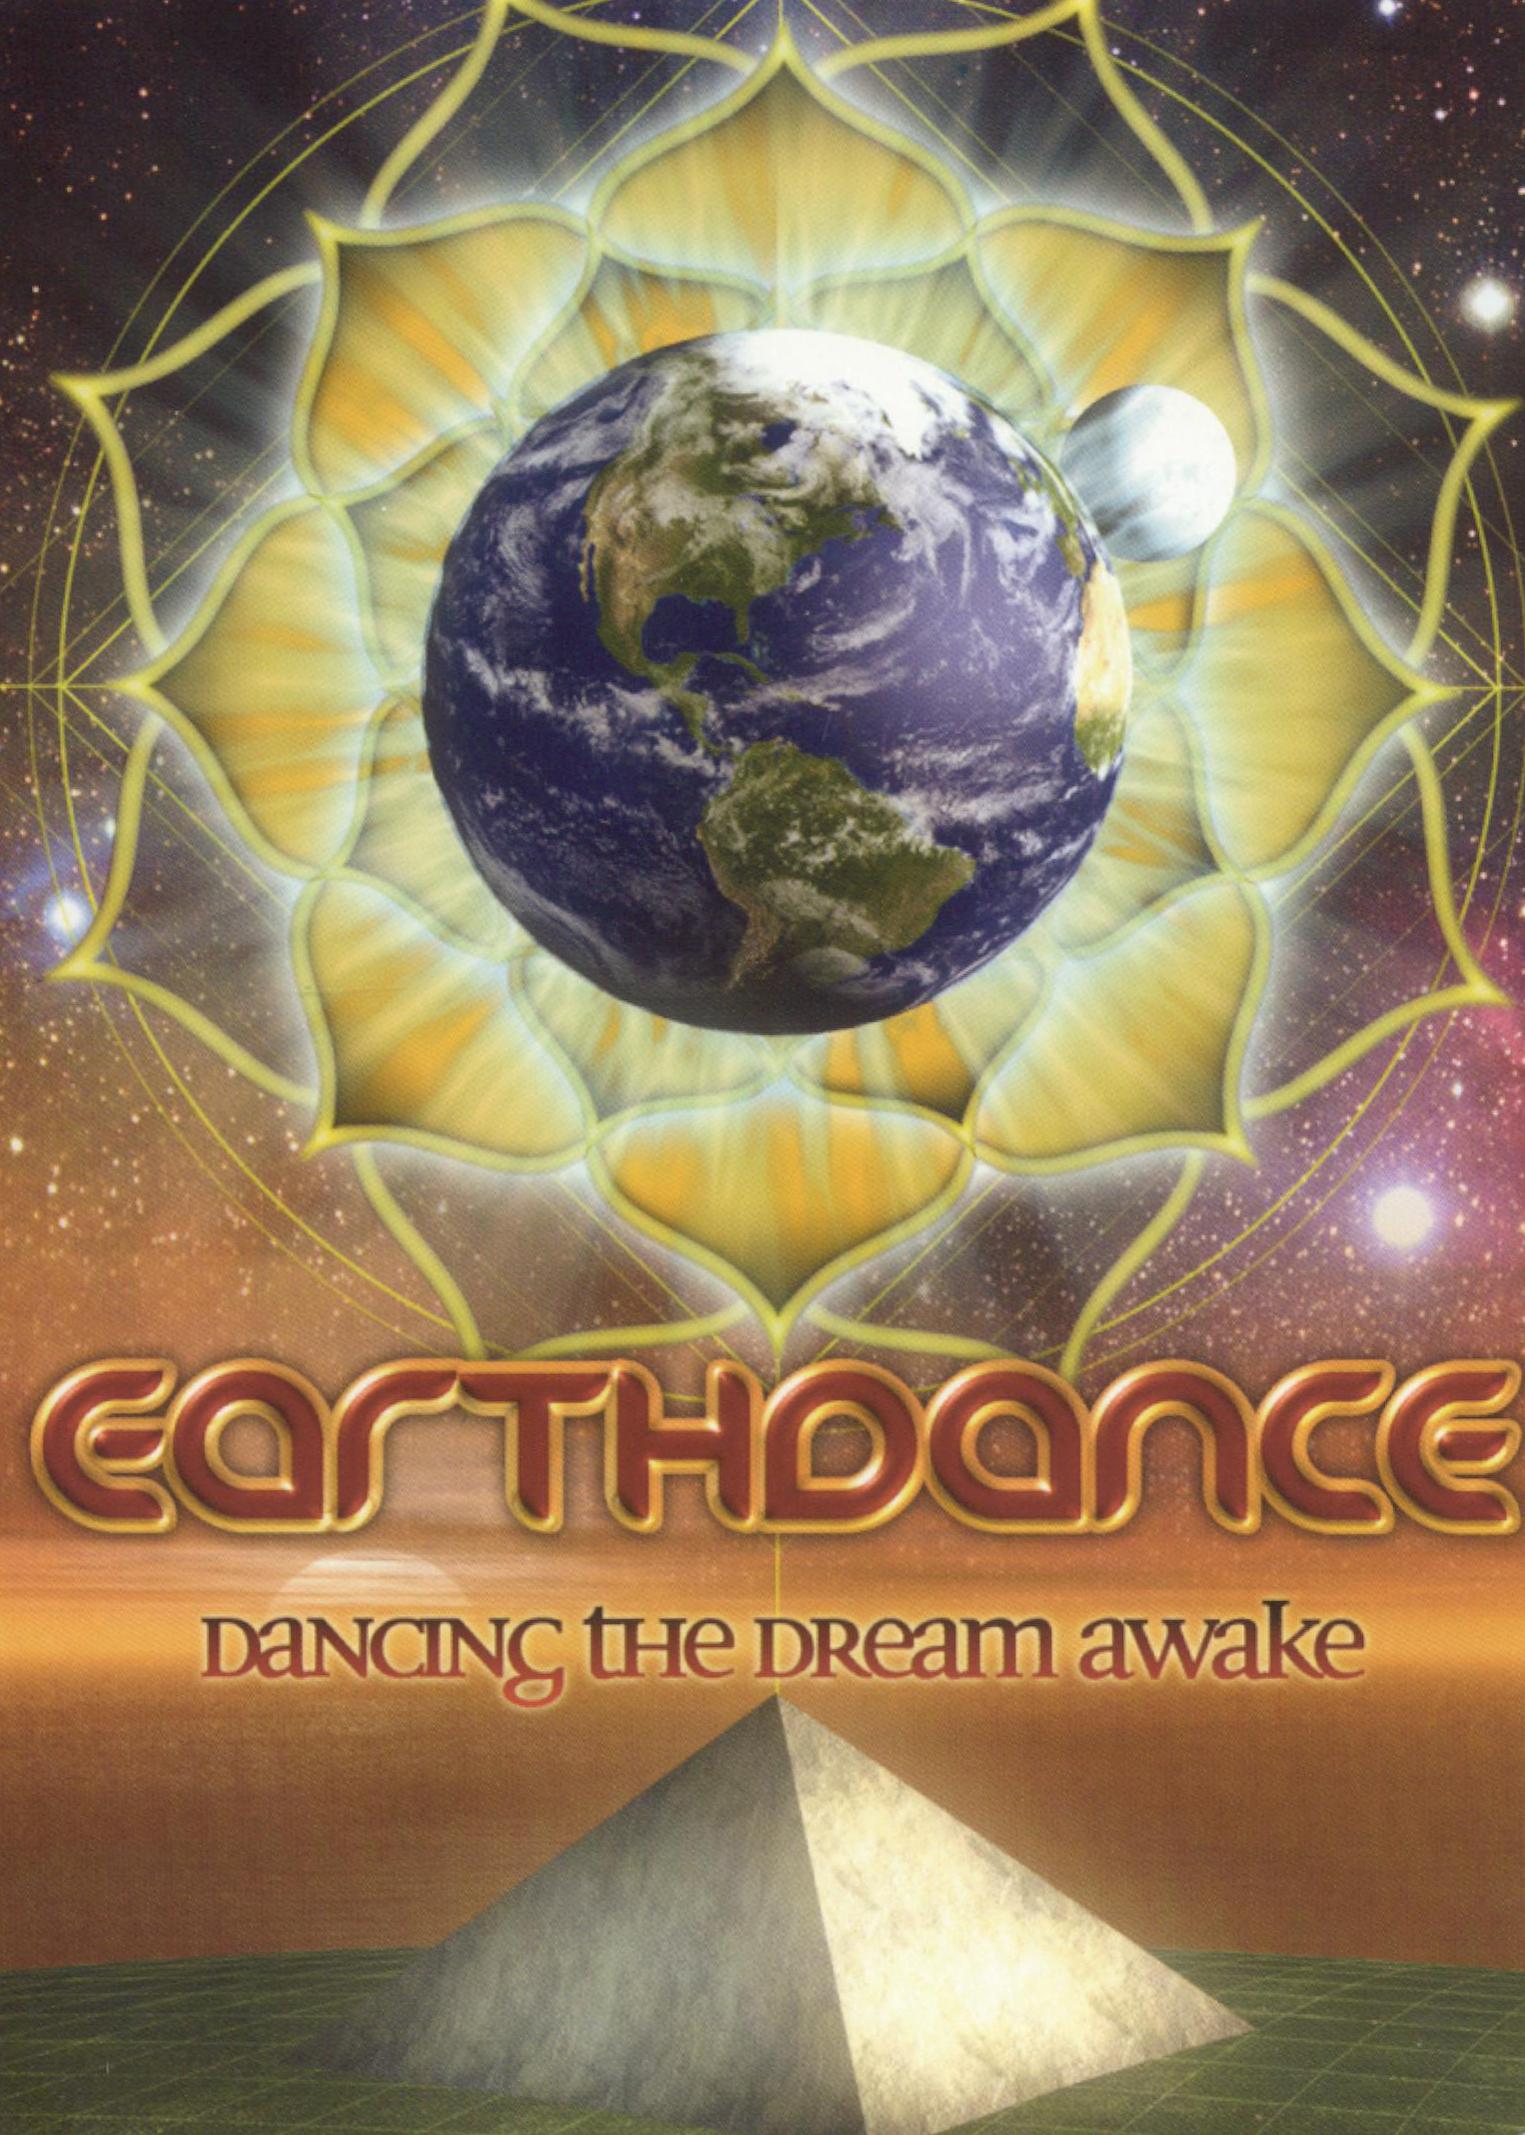 Earthdance: Dancing The Dream Awake